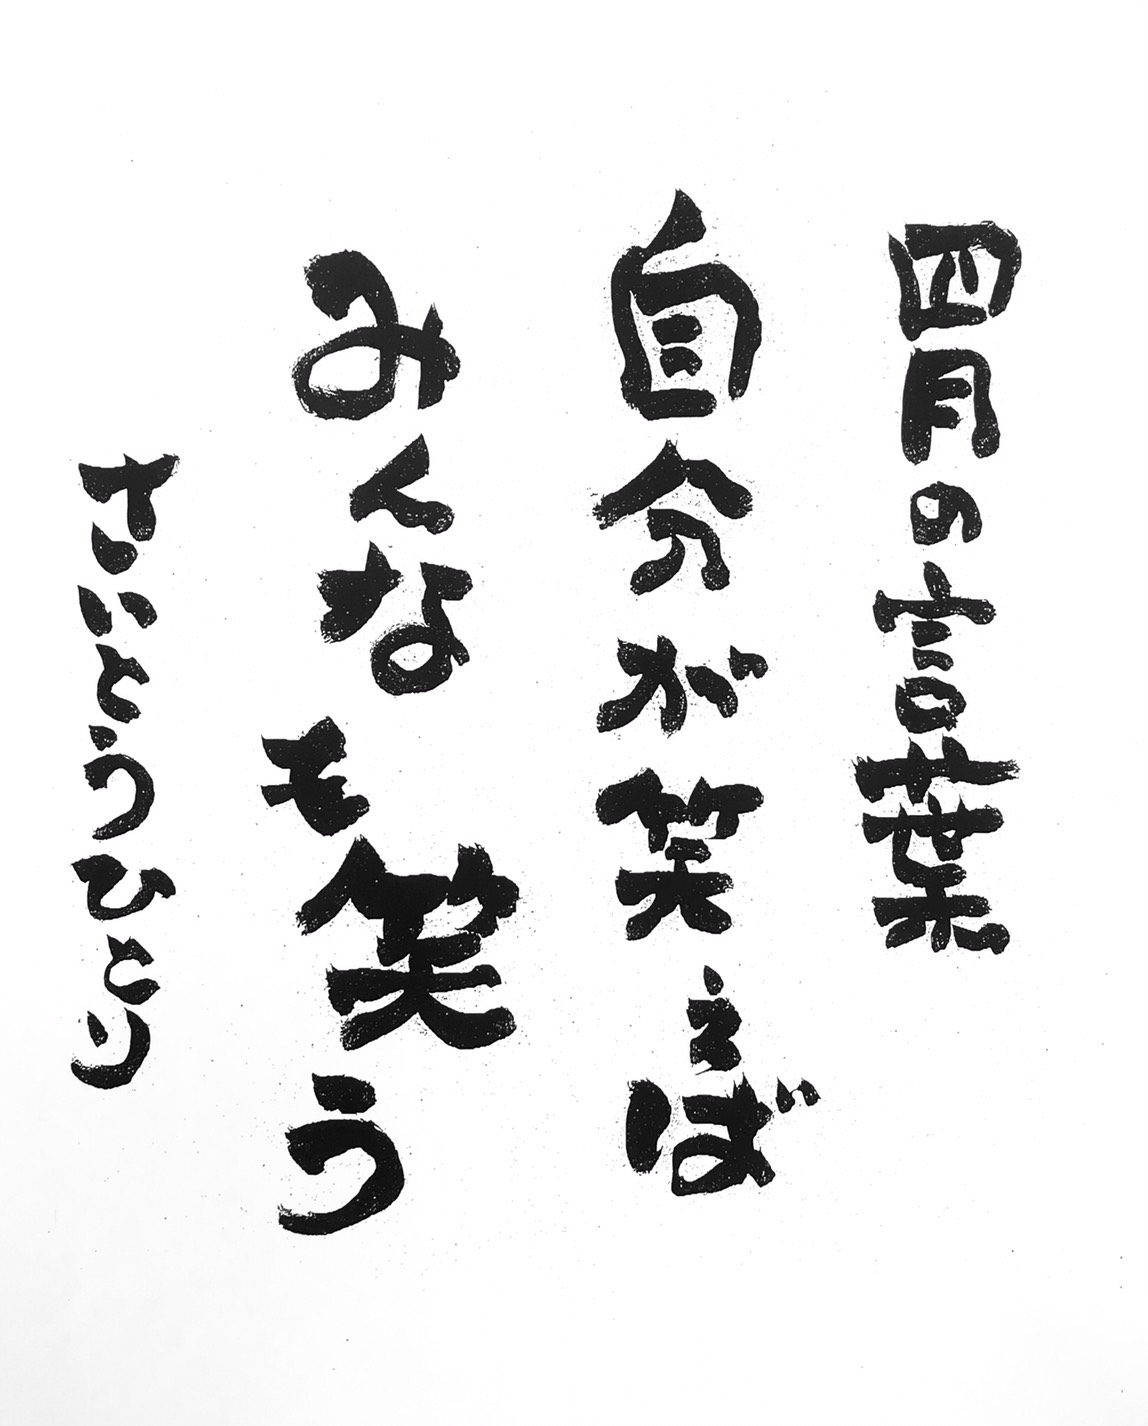 """斉藤一人 公式ブログ 一日一語 4月15日"""